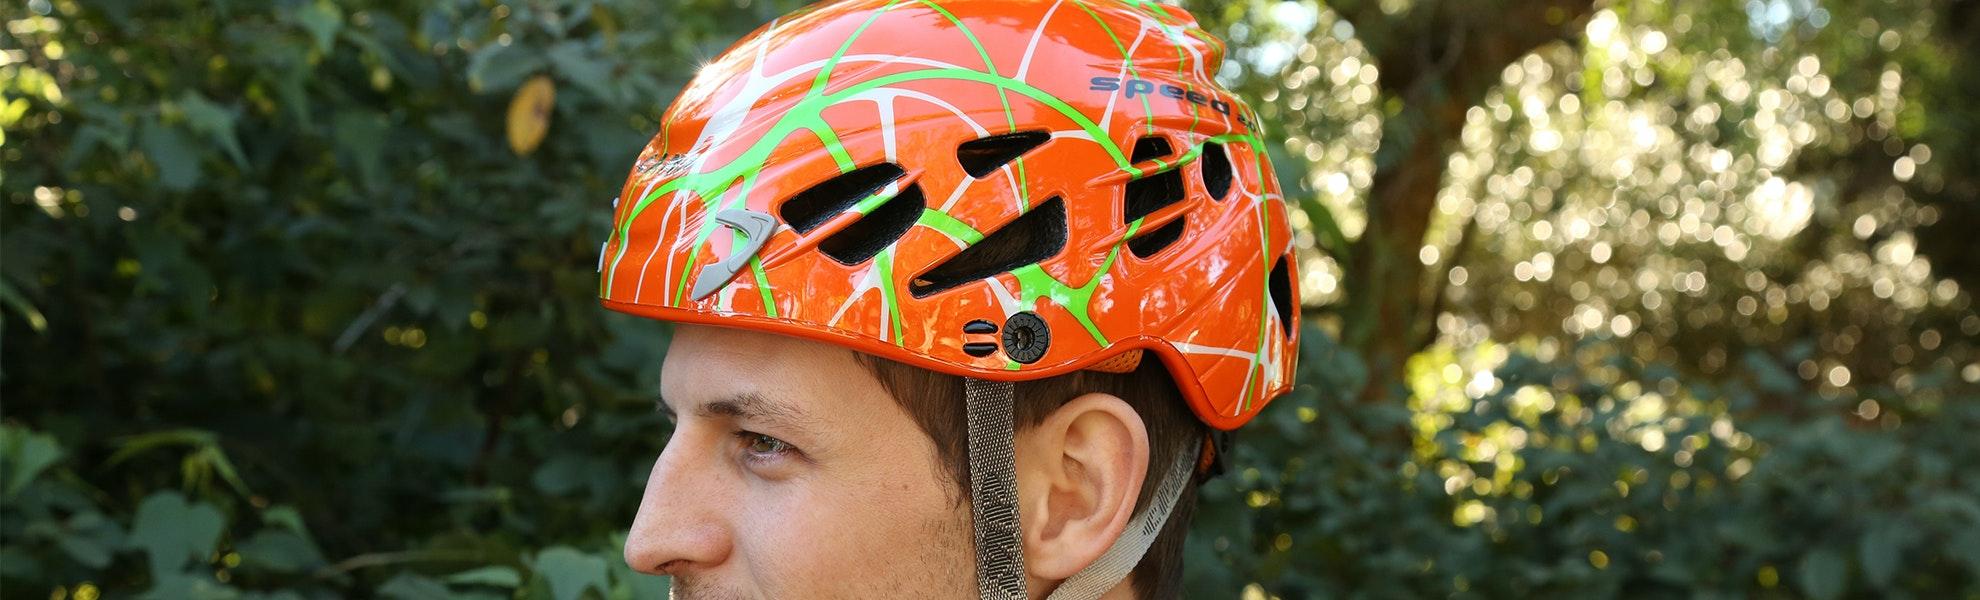 CAMP Speed 2.0 Climbing Helmet